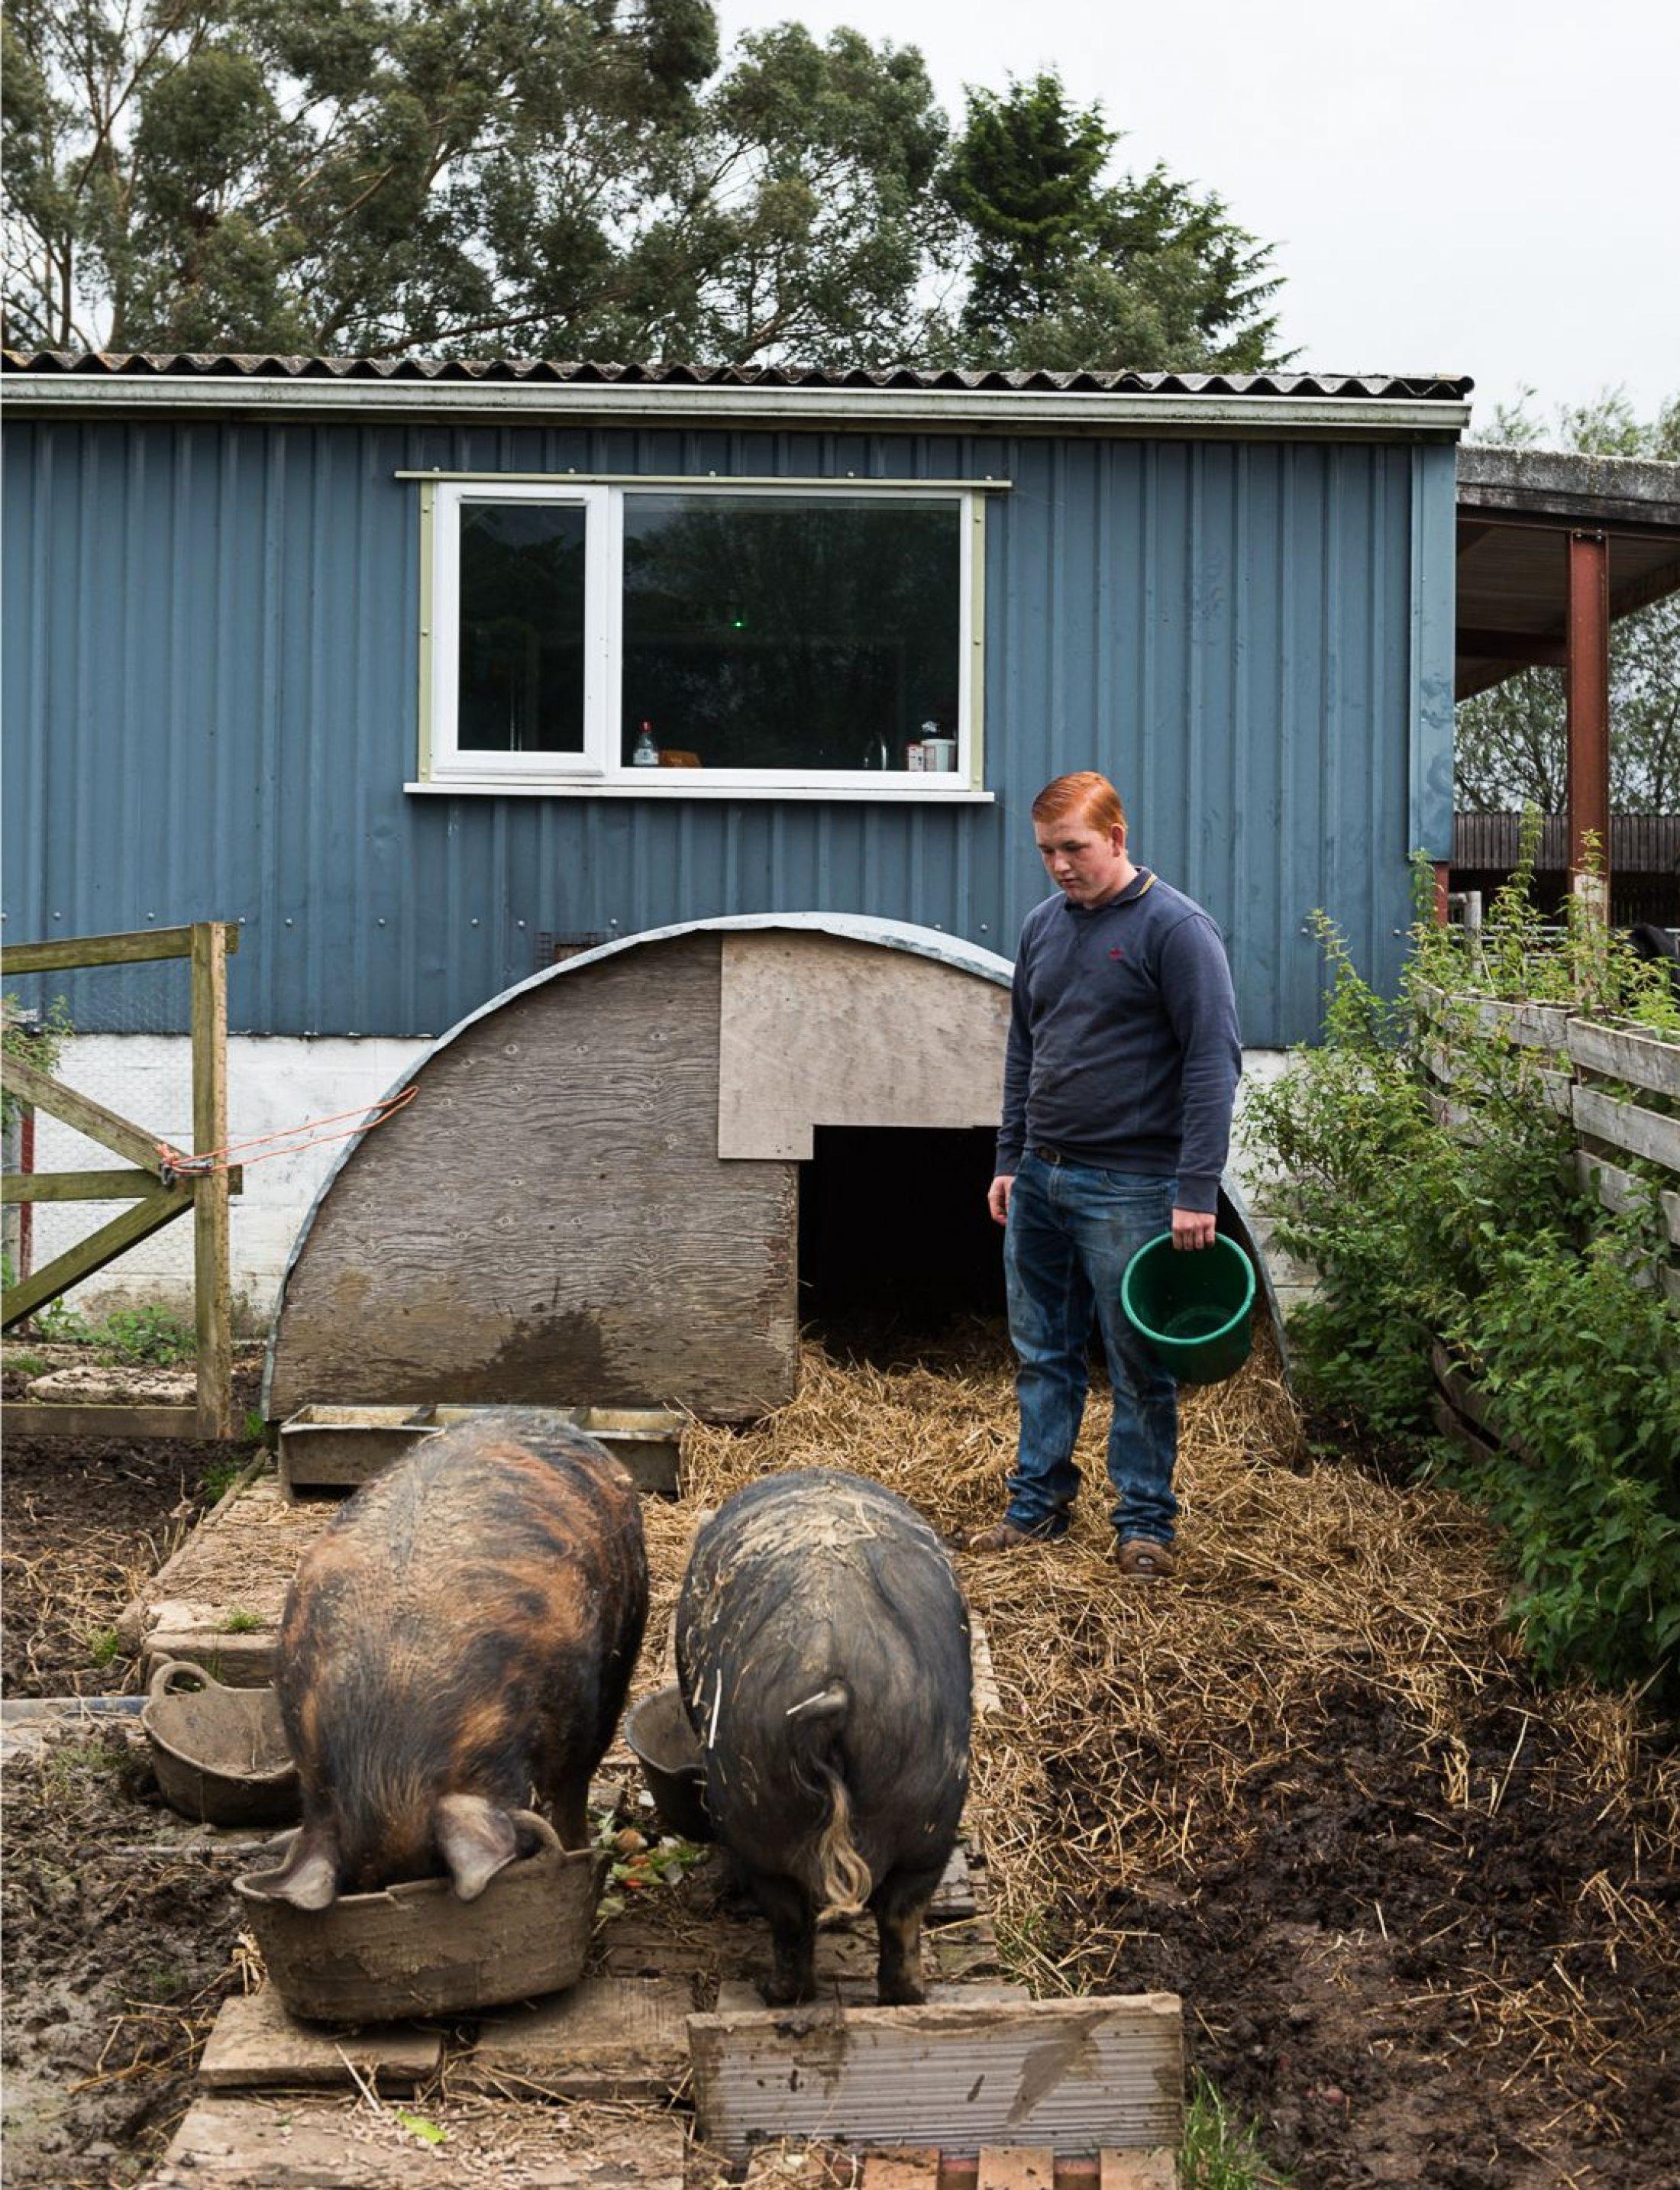 Feeding the pigs at Rylands Farm, Dorset